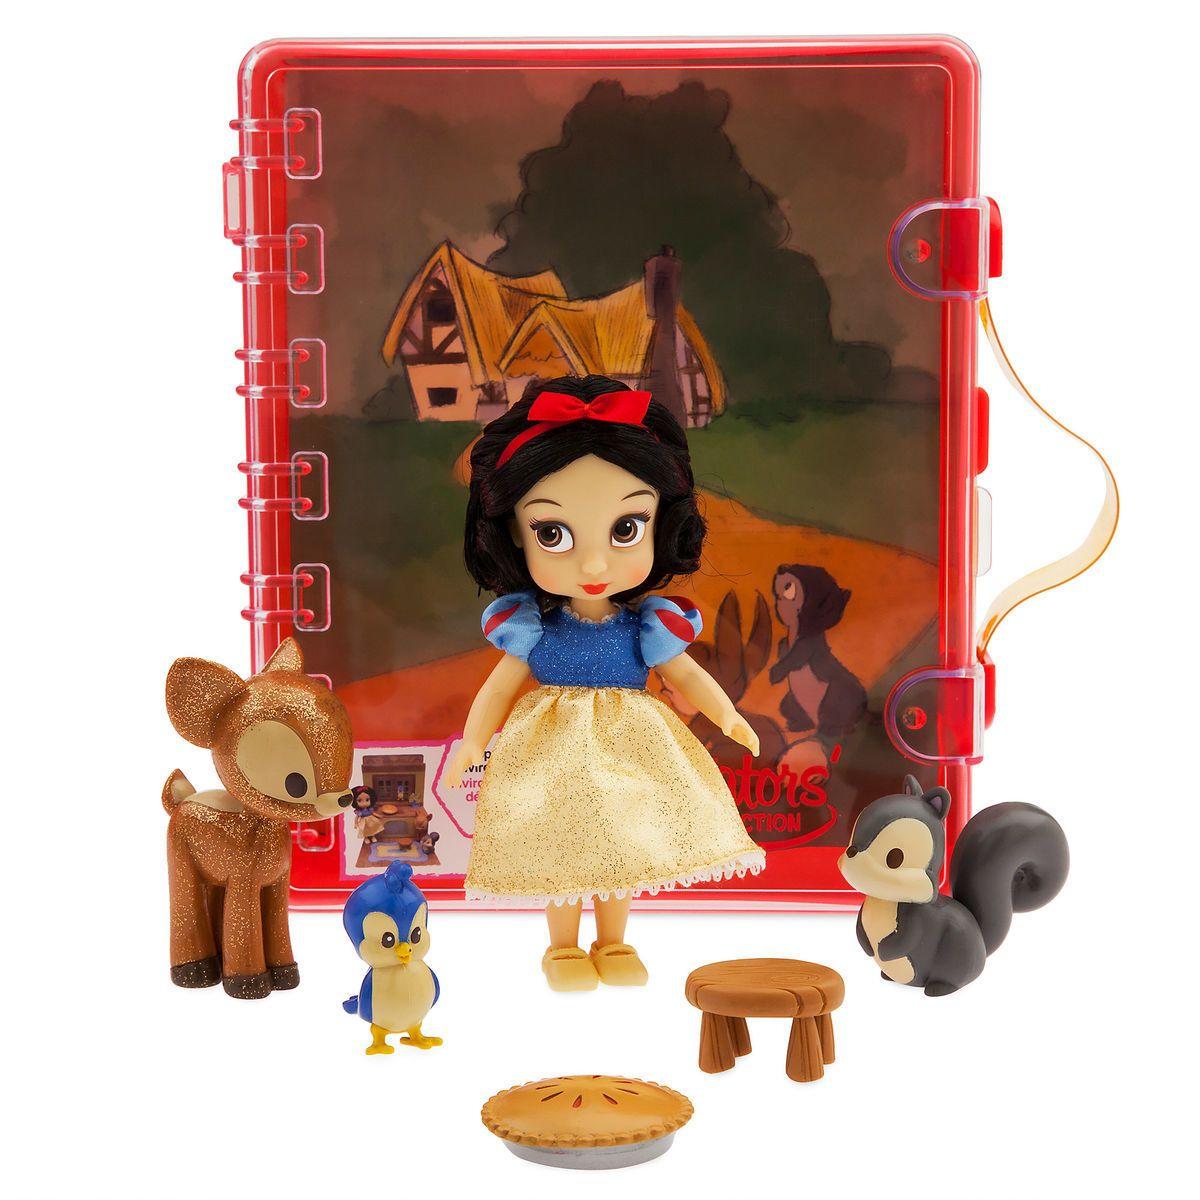 Product Image Of Disney Animators Collection Snow White Mini Doll Playset 2 Disney Animators Collection Disney Store Uk Disney Store